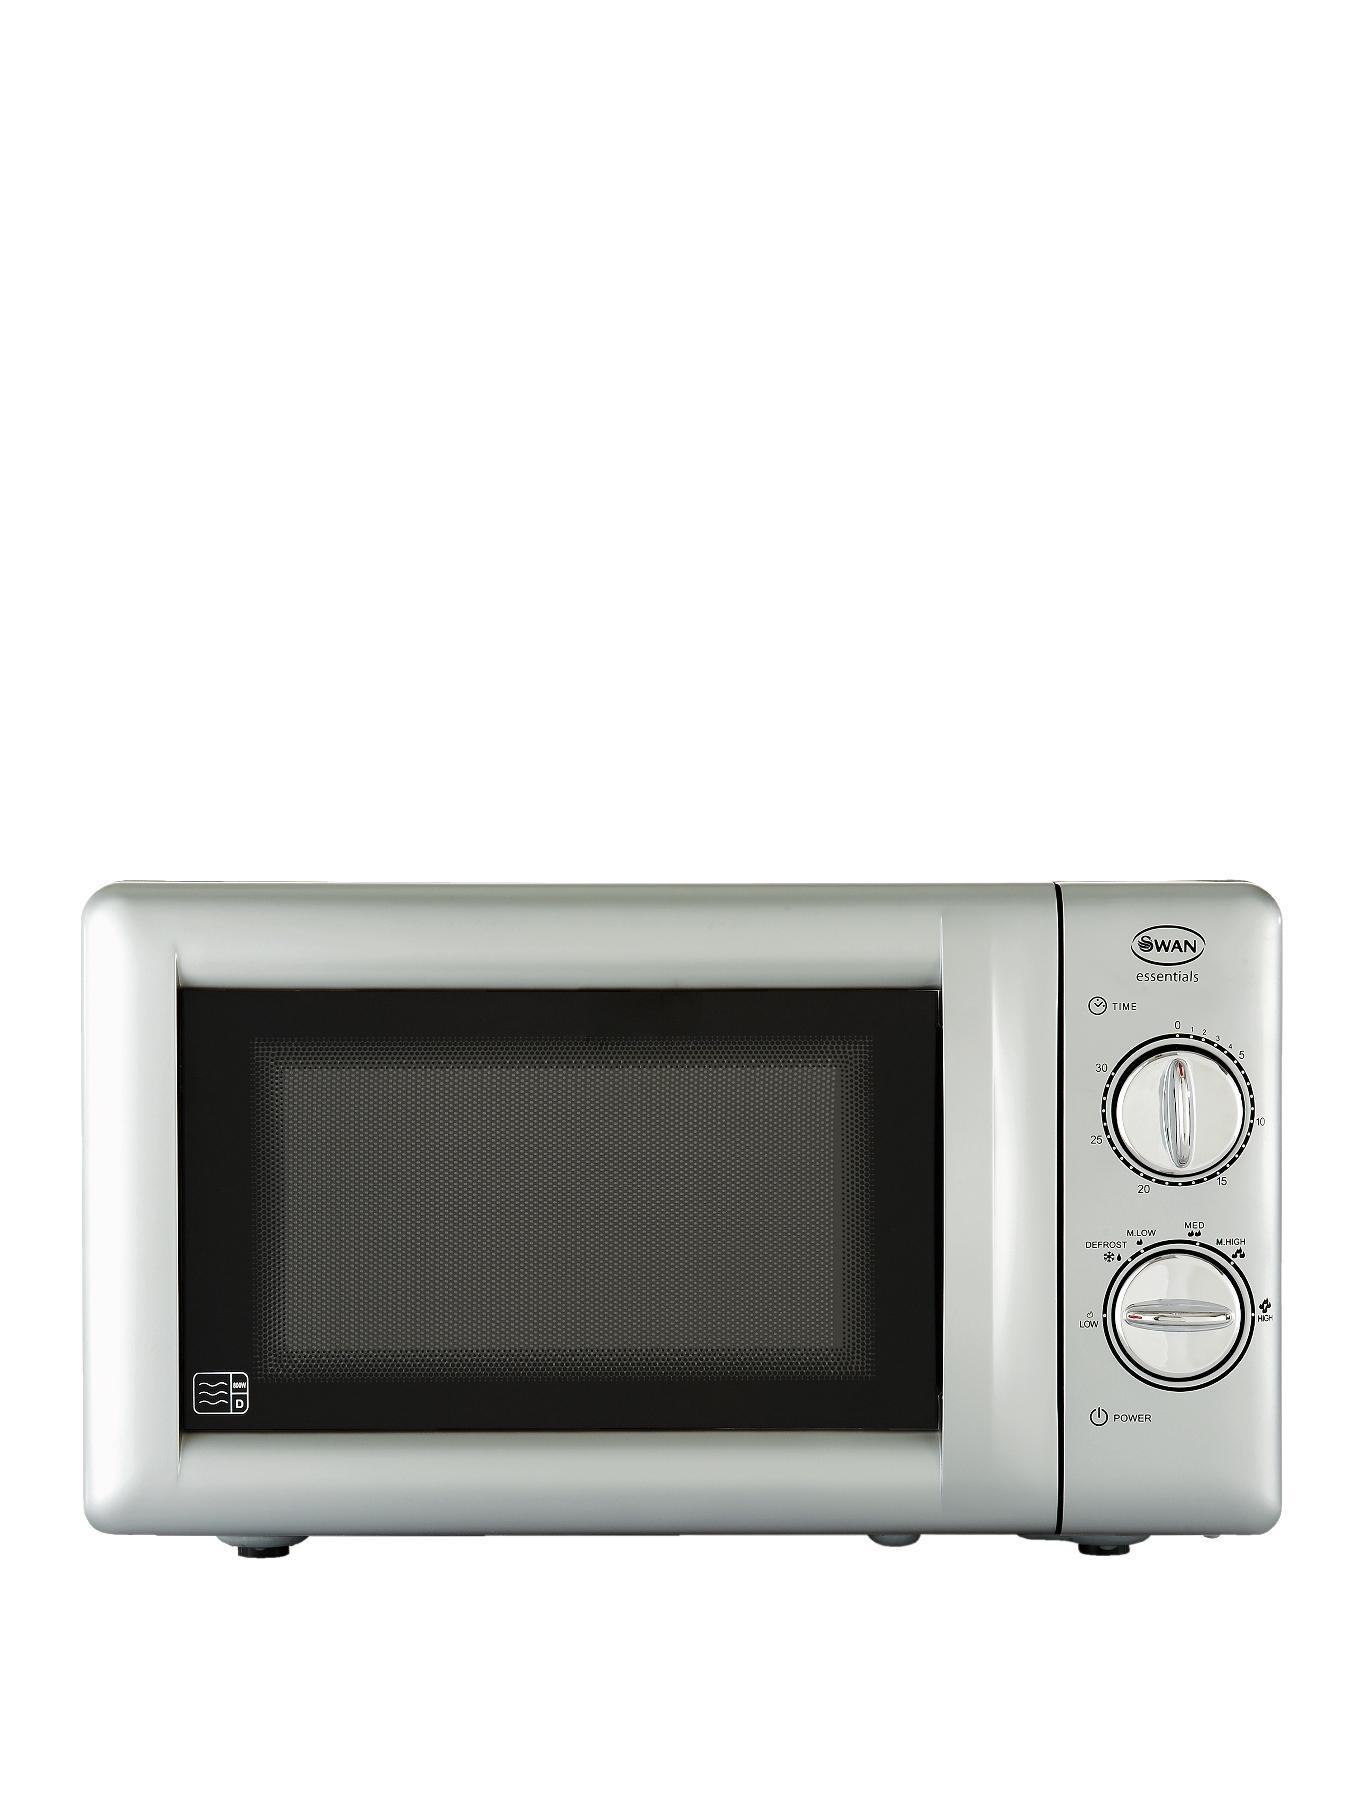 SM22020S 800 Watt Microwave - Silver